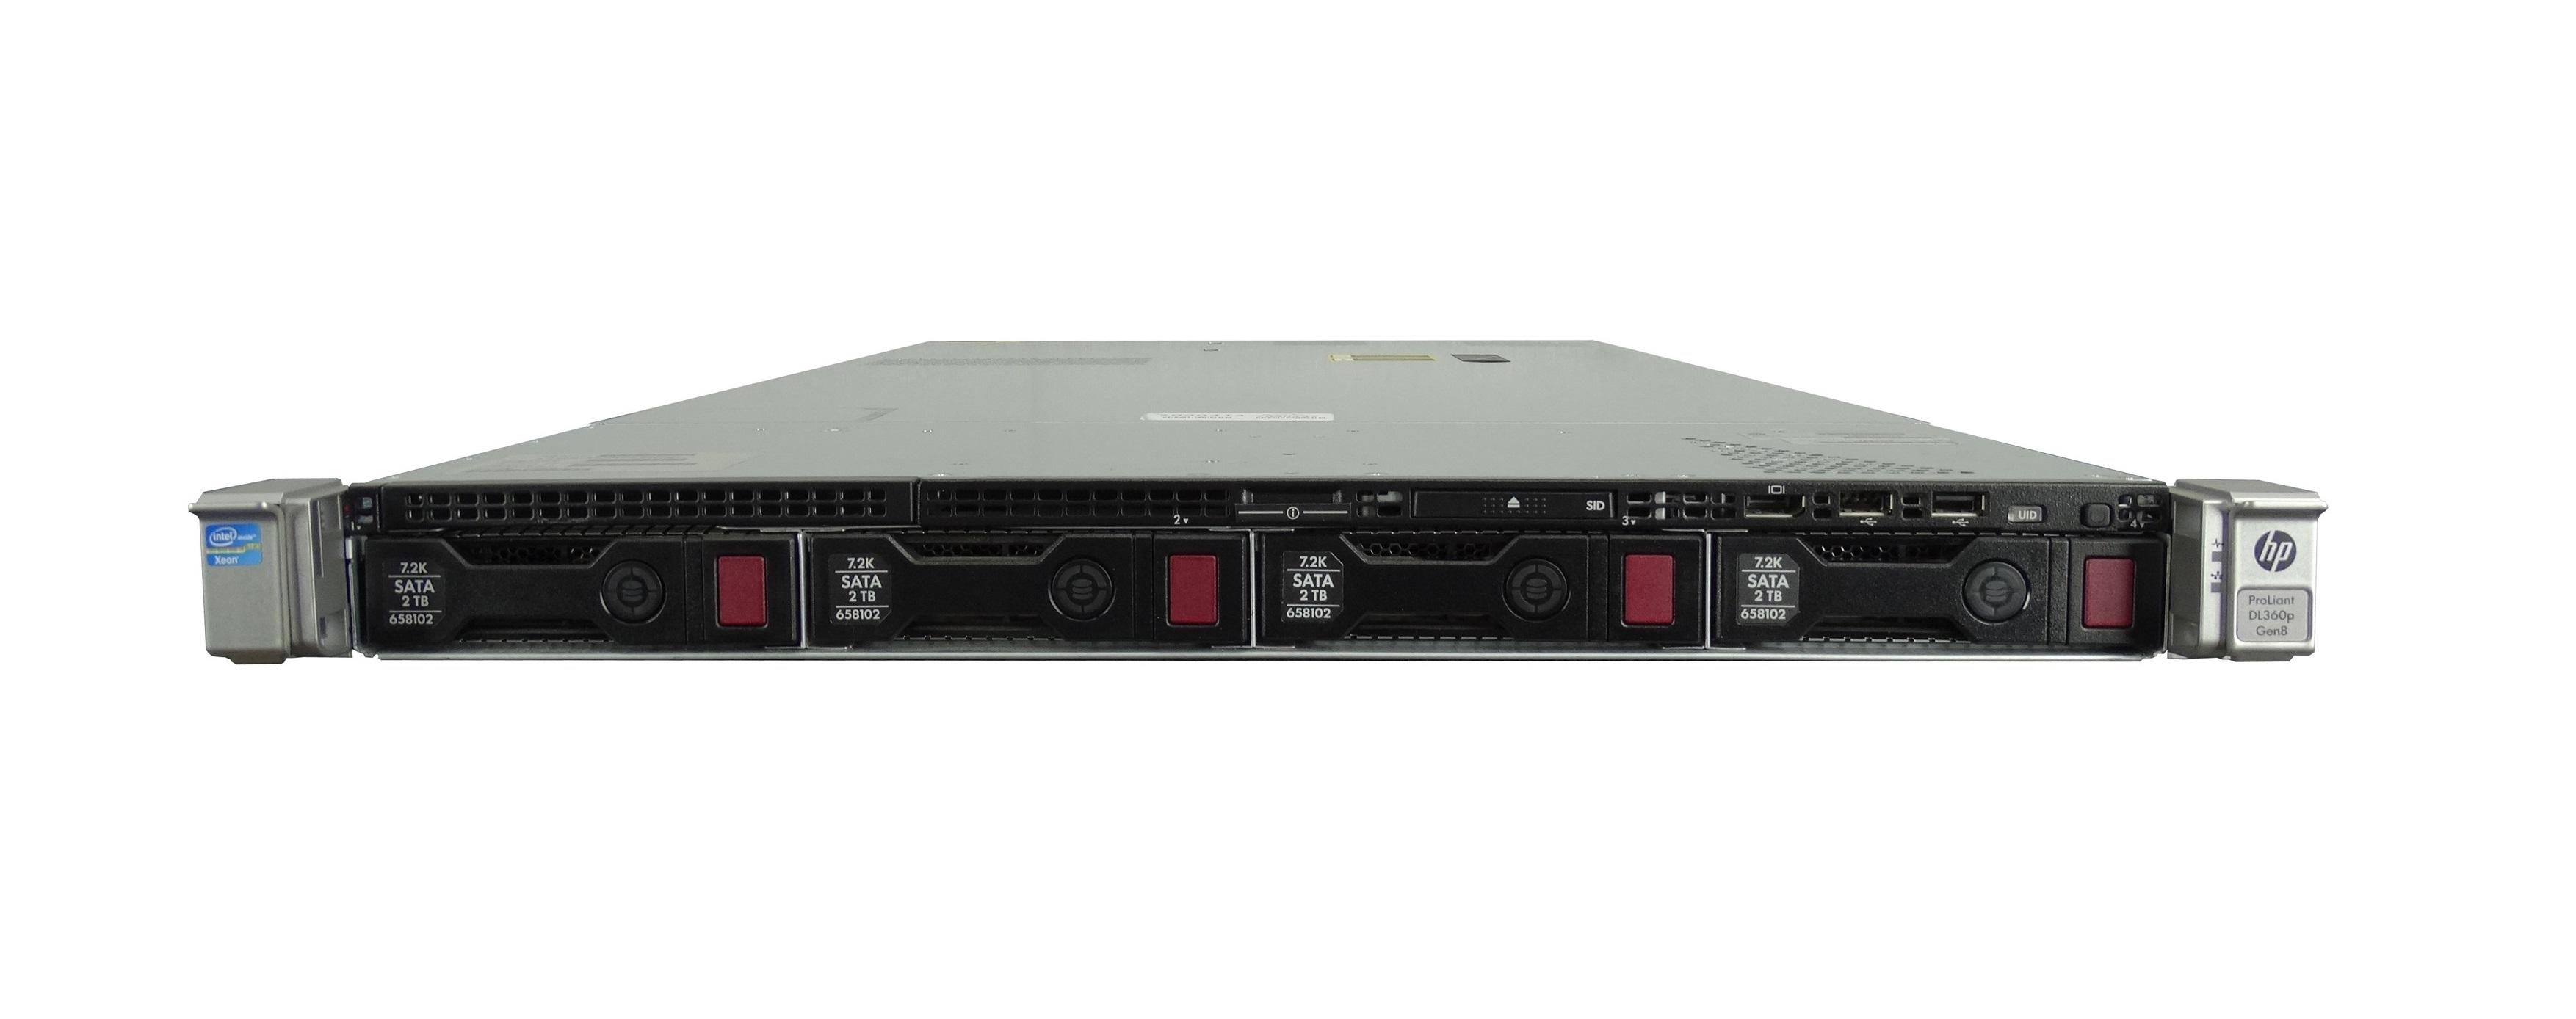 HP ProLiant DL360p Gen 8 4 Bay LFF 1U Rackmount Server